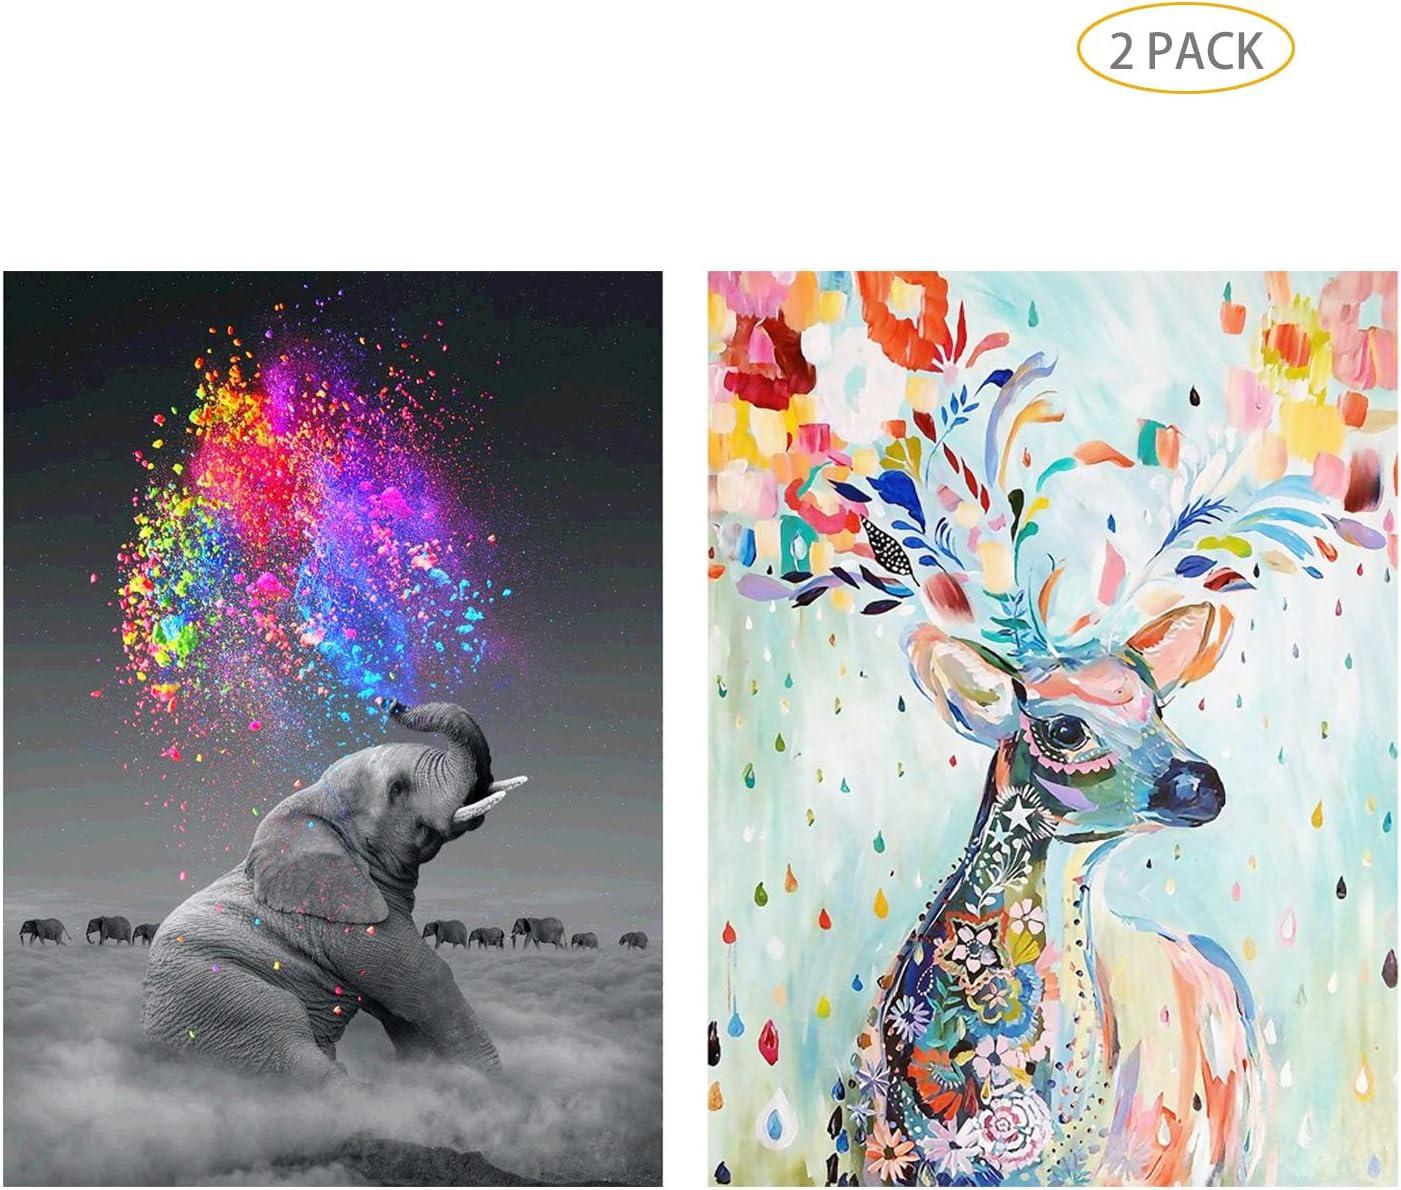 Full Drill Deer Moon 5D Diamond Painting Kits for Adult Beginners